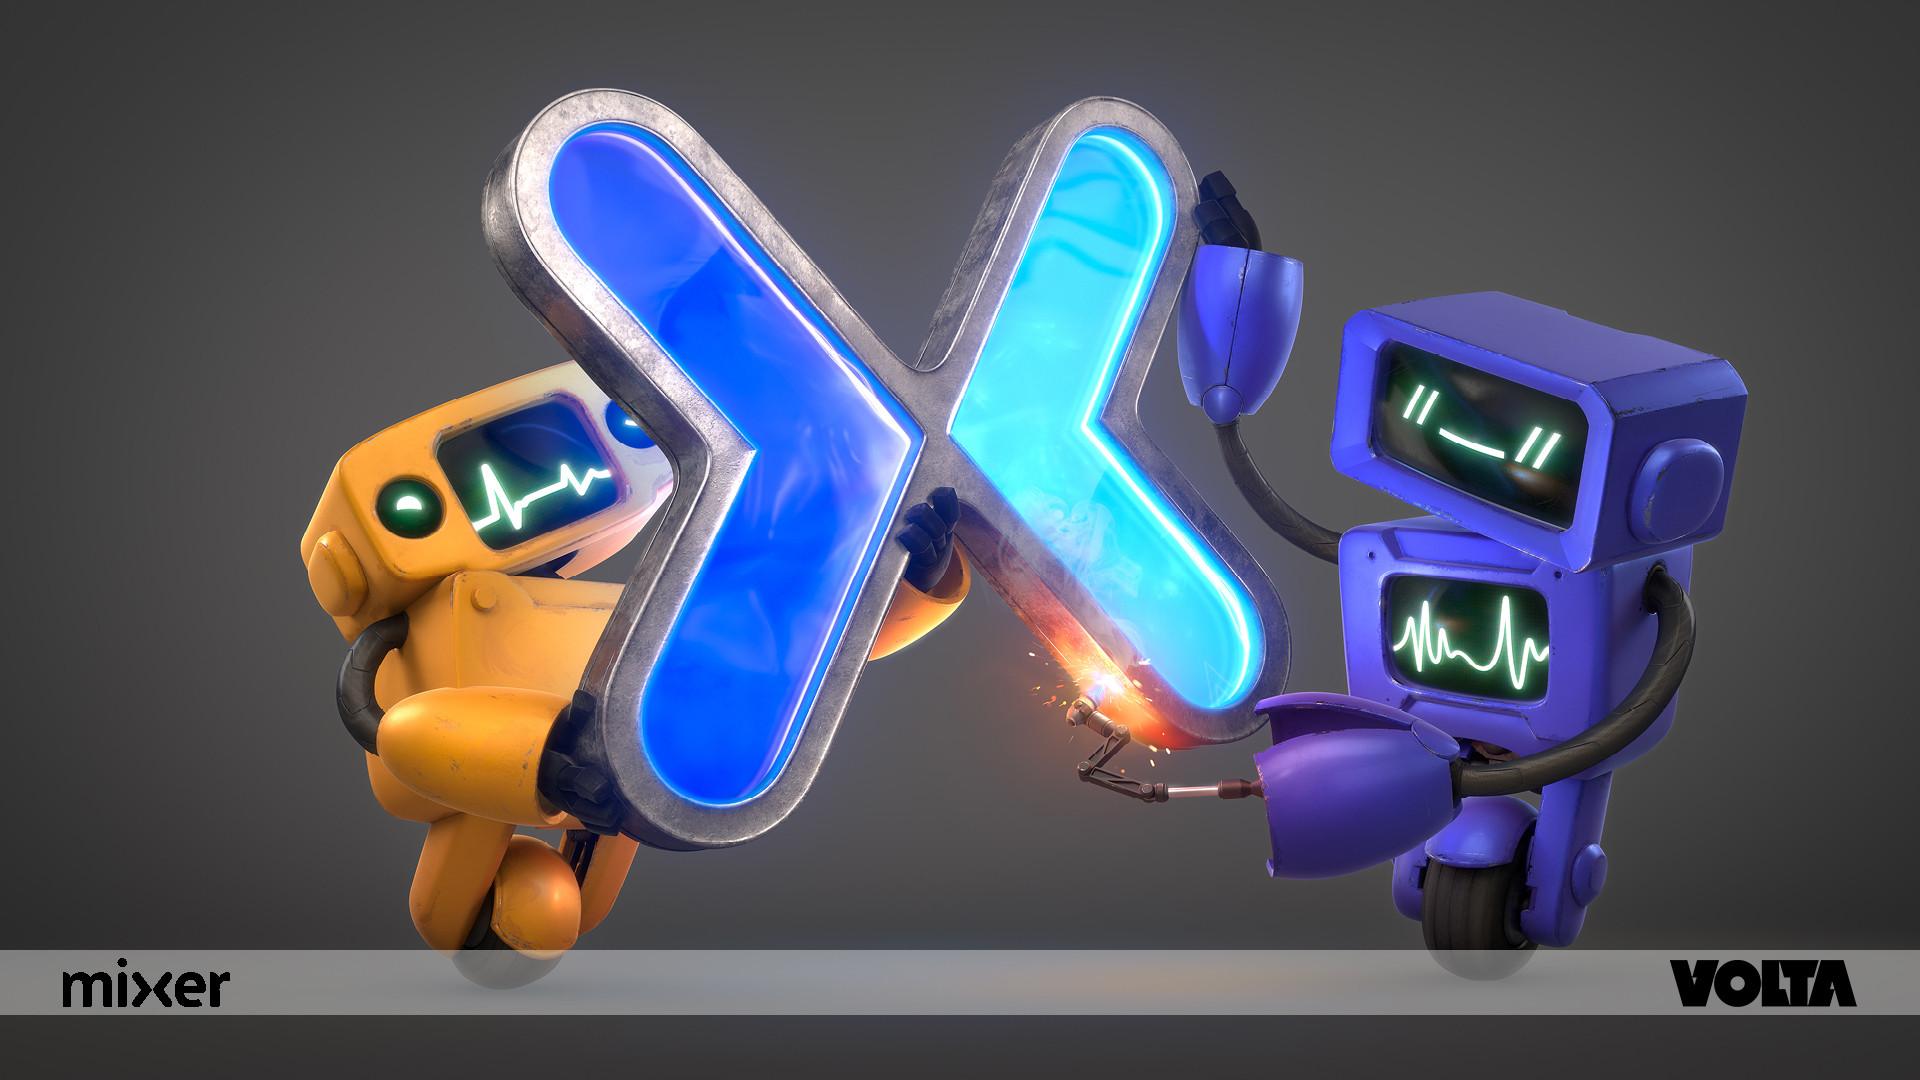 Mixer - BorkBot and DevBot